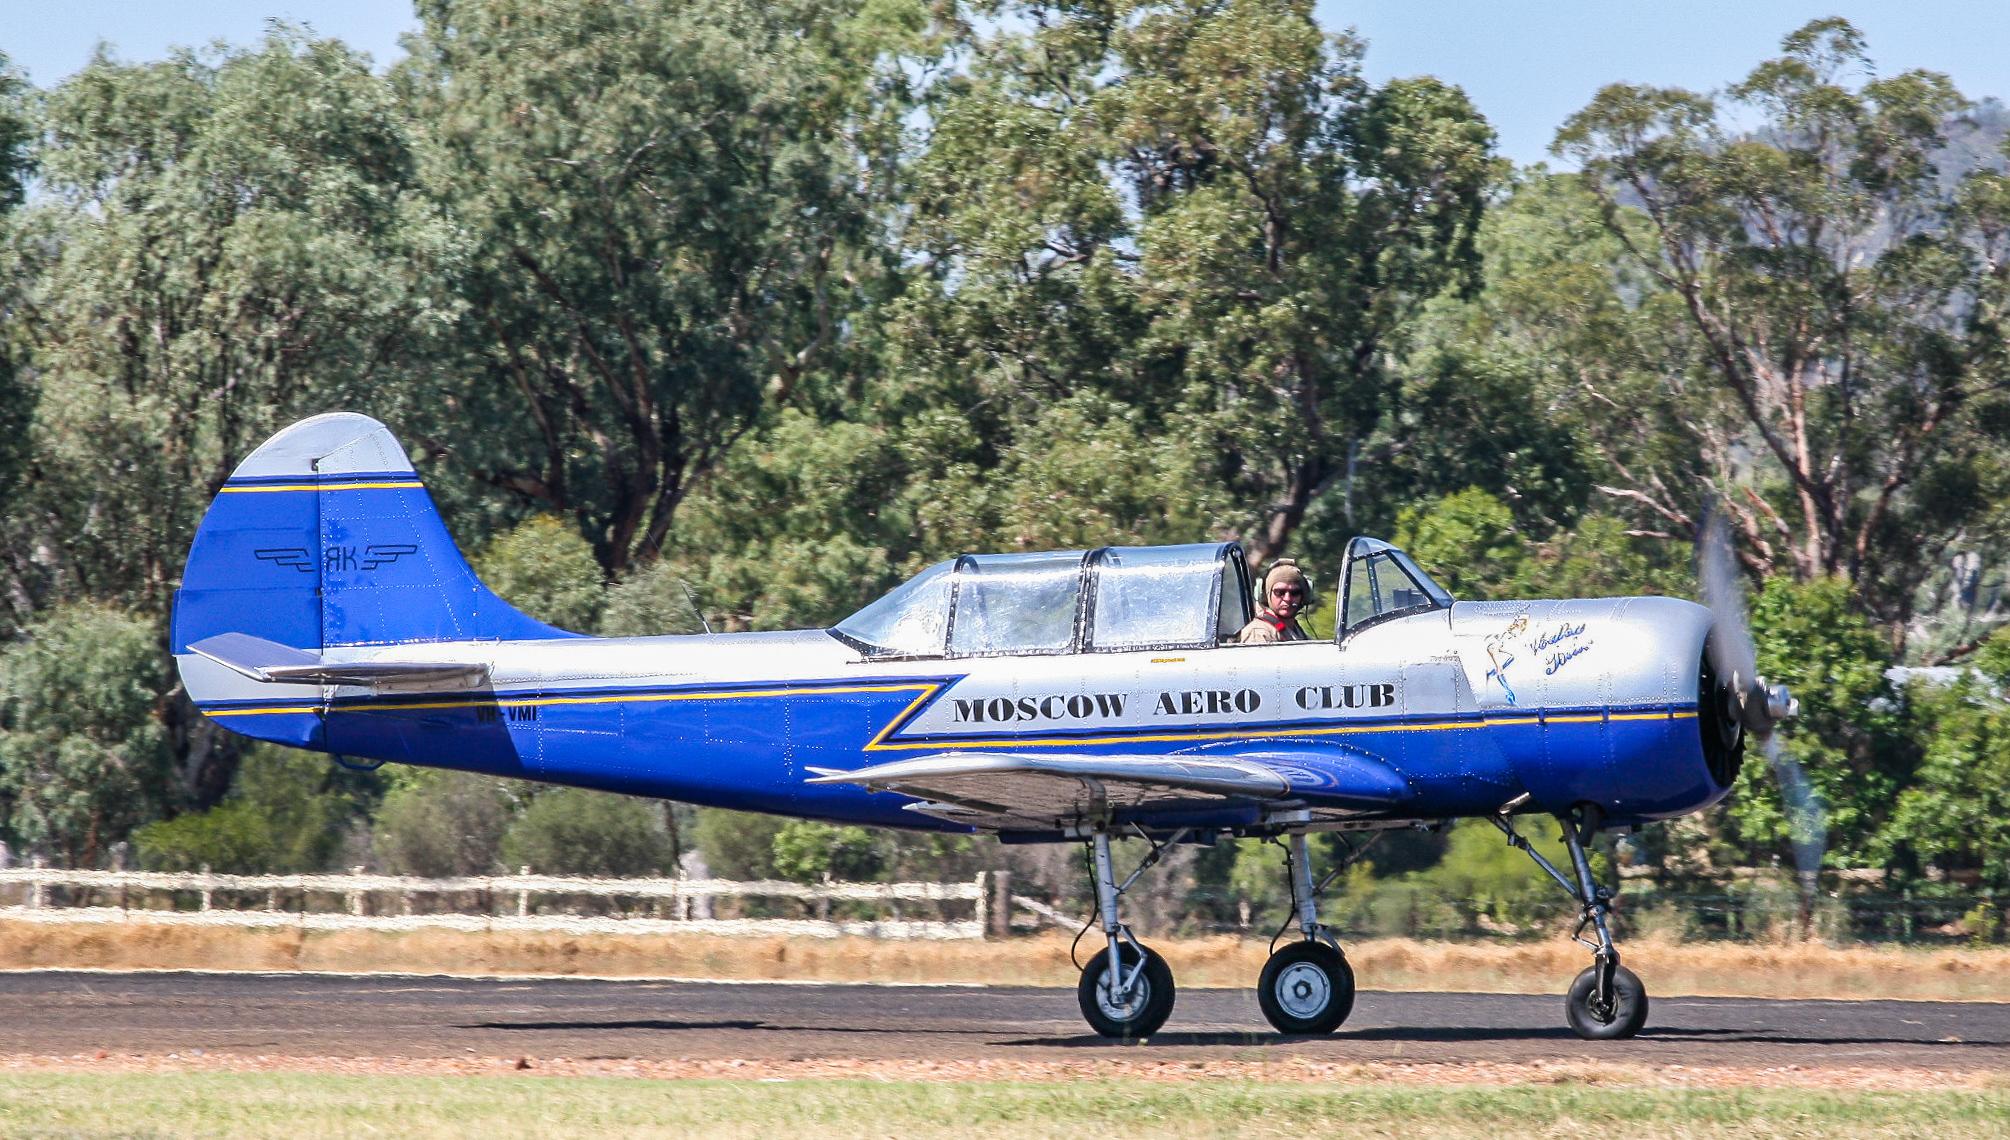 IMG_0227 - Phil Buckley photo - Gunnedah Air Show - March 14, 2015